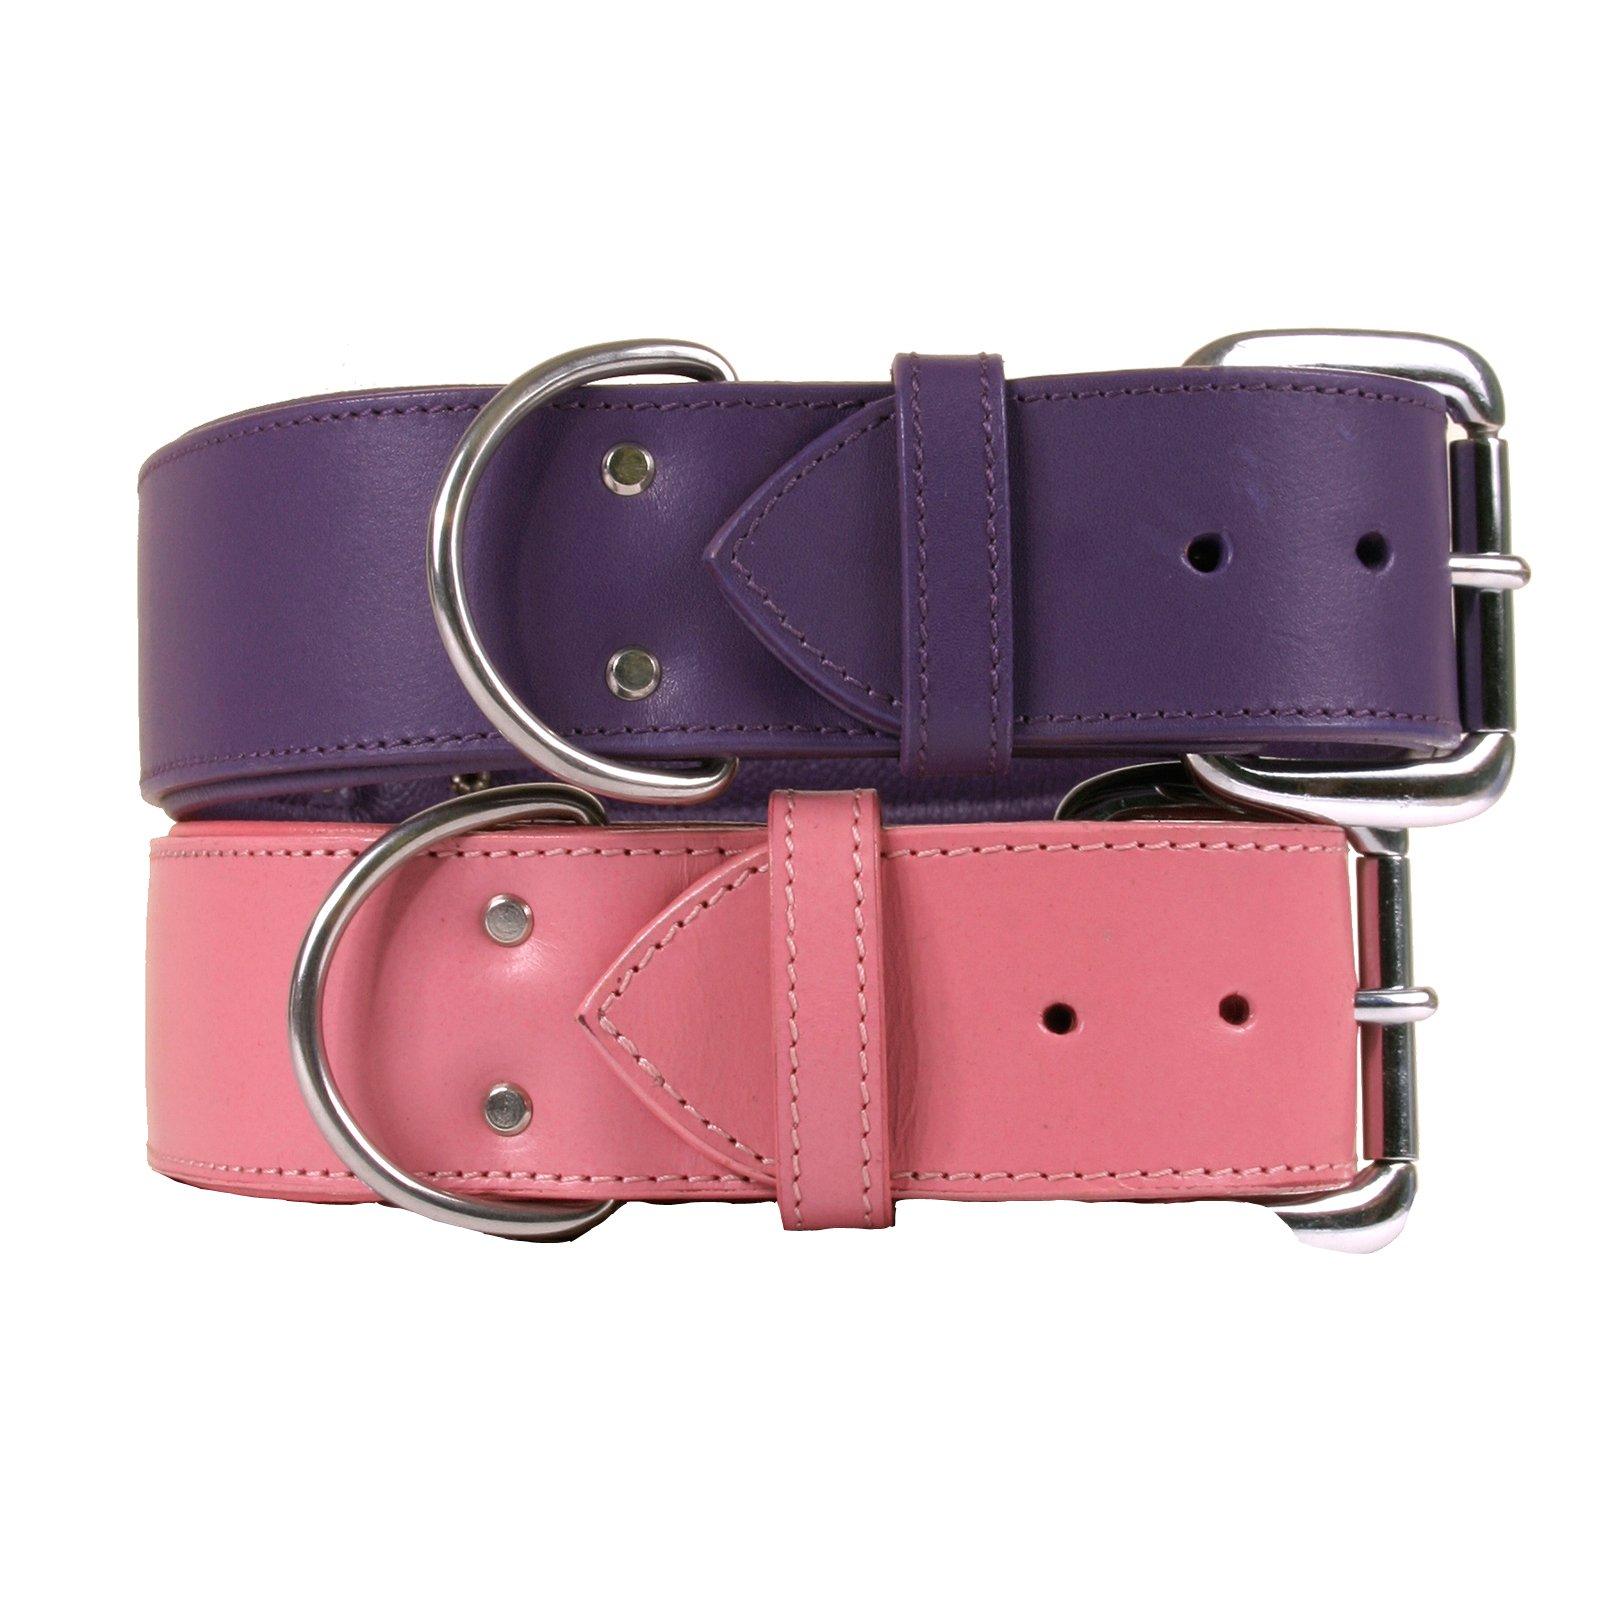 Dallas Luxury Leather Padded Dog Collar -Pink - 22'' x 1.5''